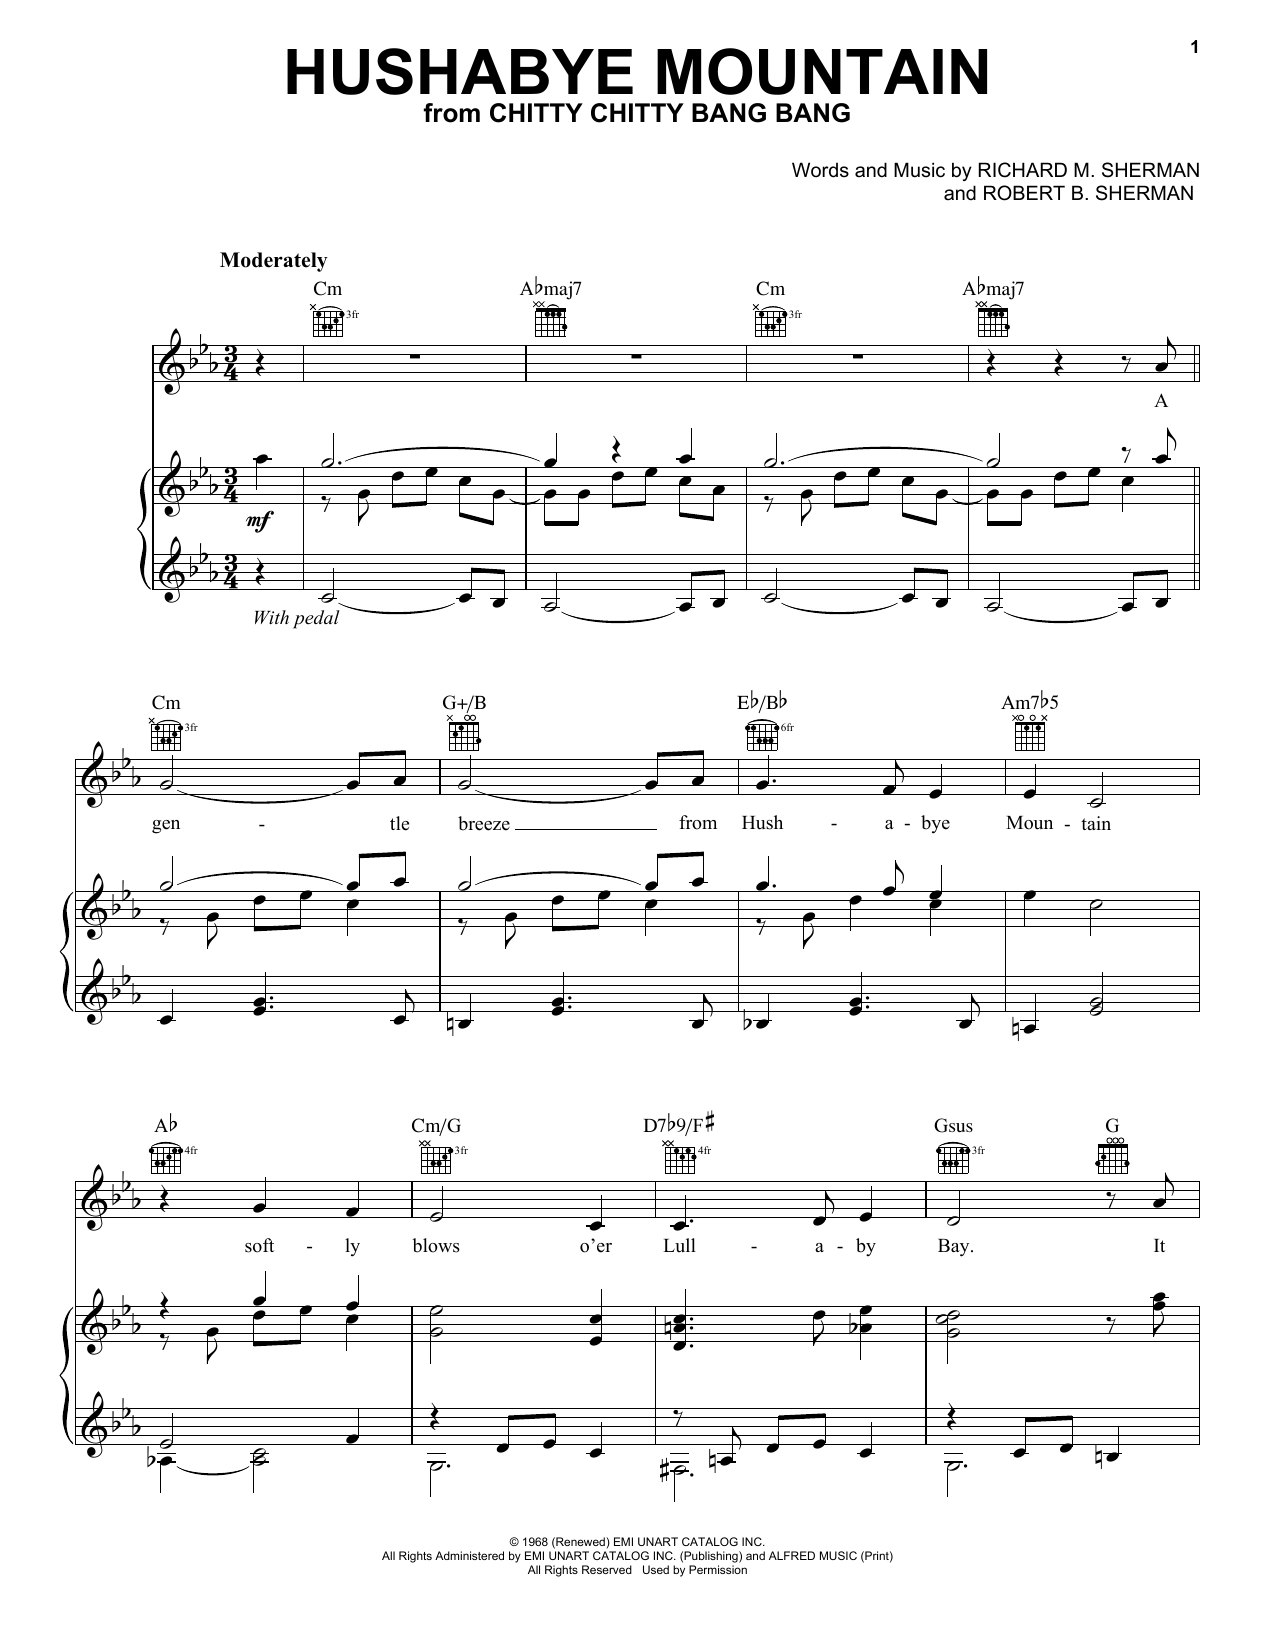 Hushabye Mountain (from Chitty Chitty Bang Bang) (Piano, Vocal & Guitar (Right-Hand Melody))